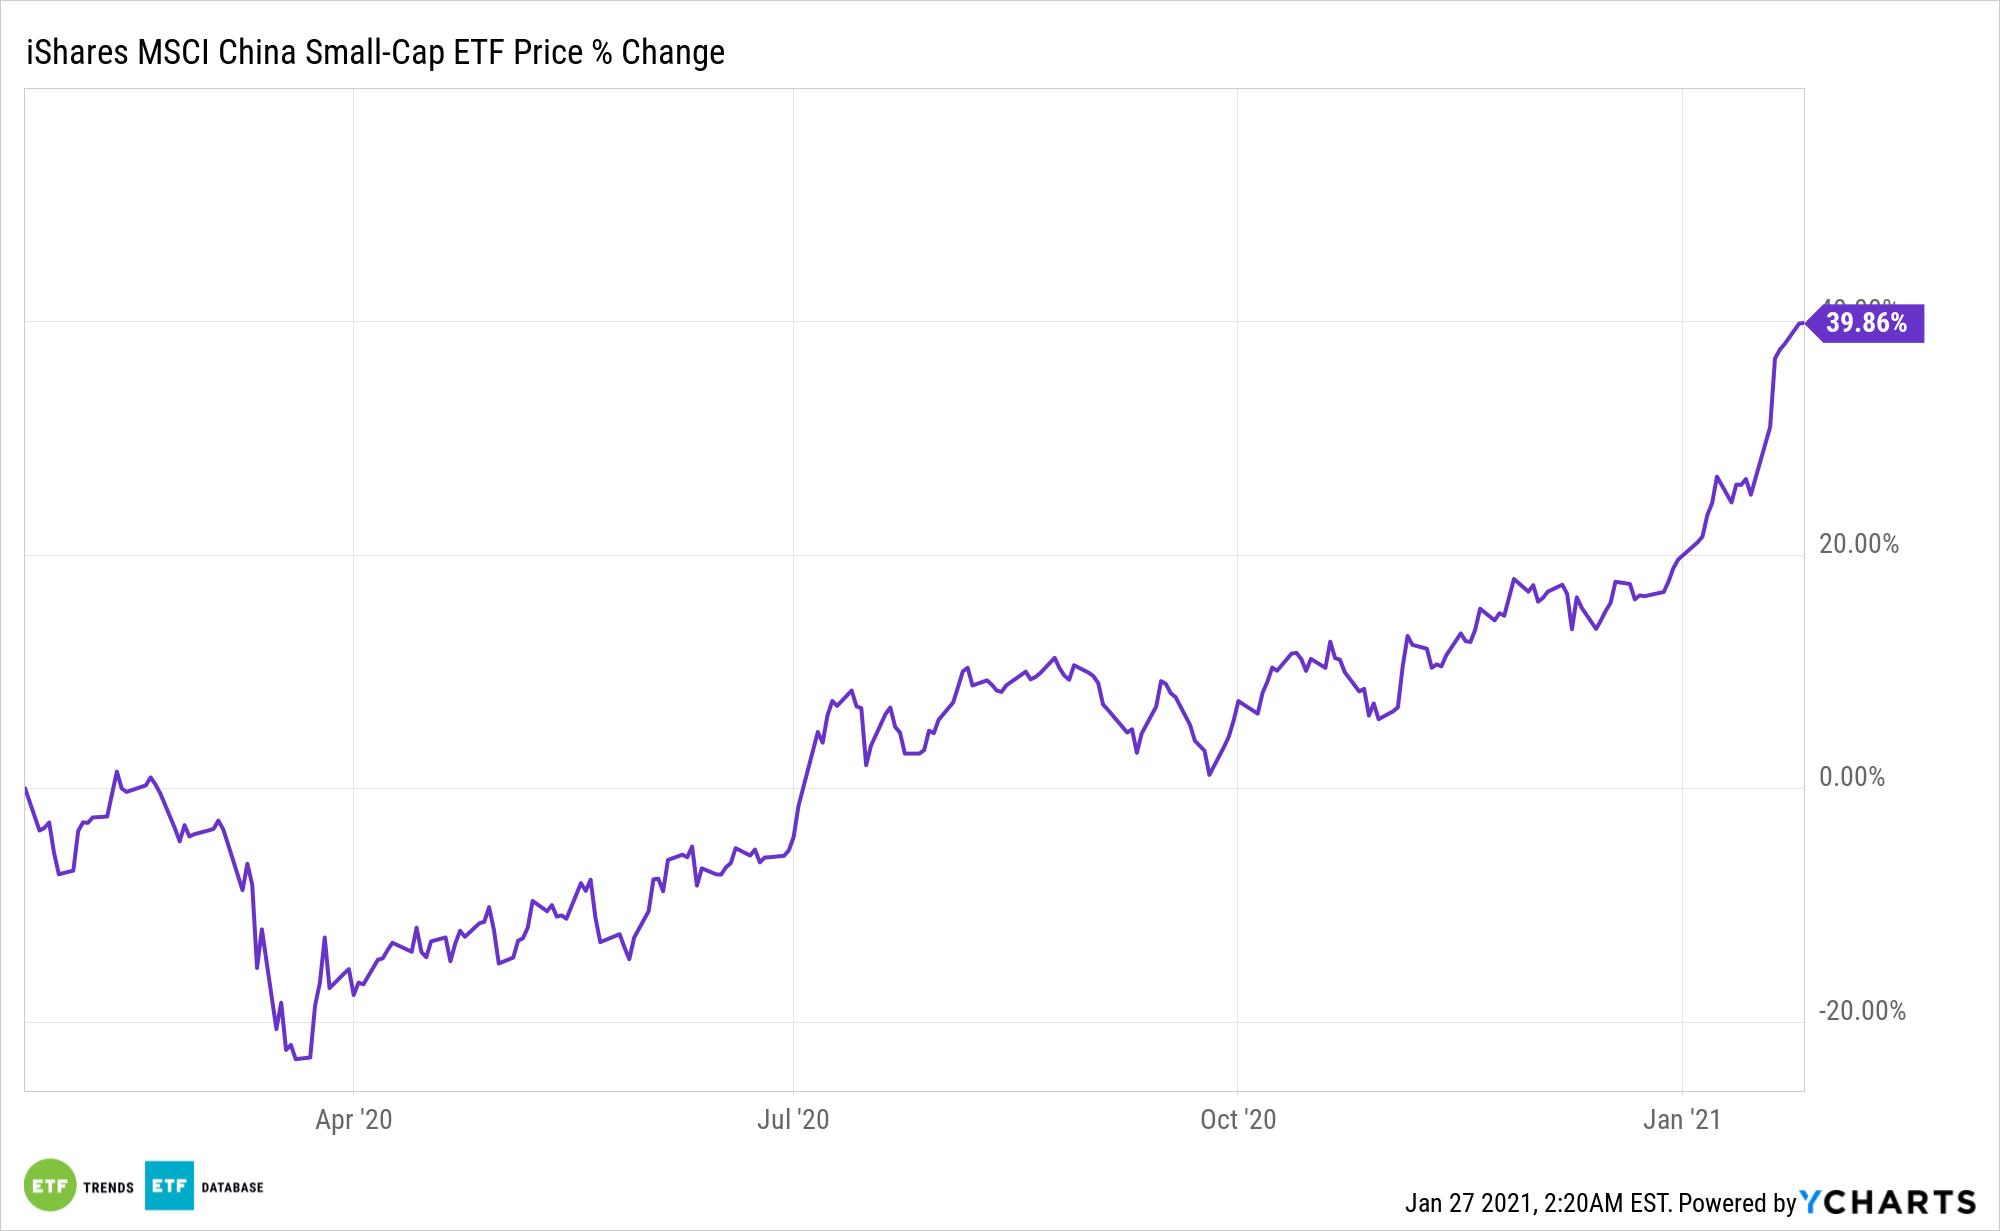 ECNS Chart